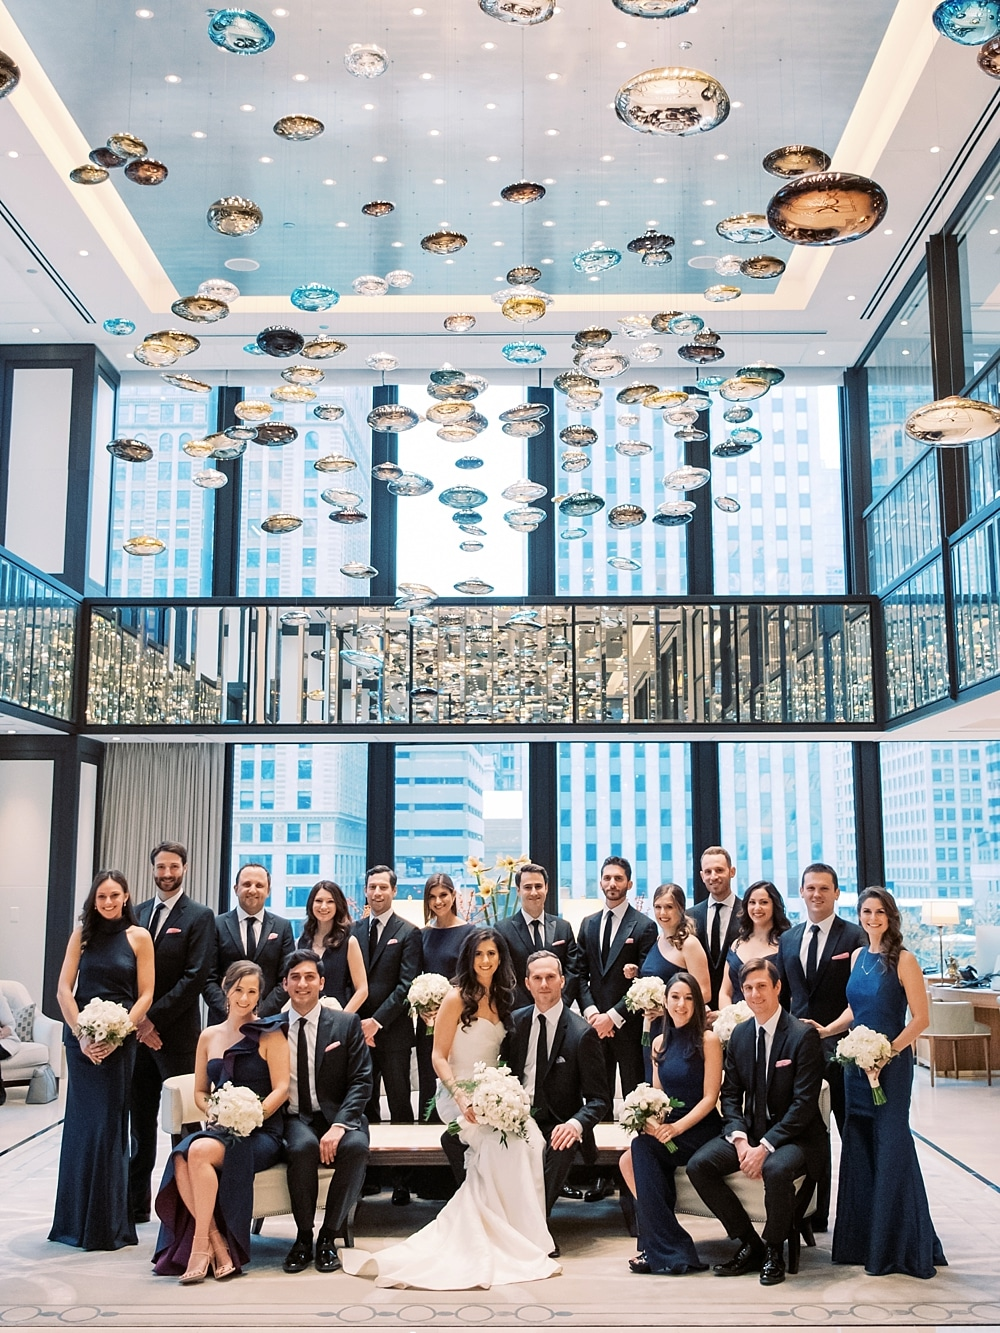 kristin-la-voie-photography-chicago-wedding-photographer-langham-hotel-25